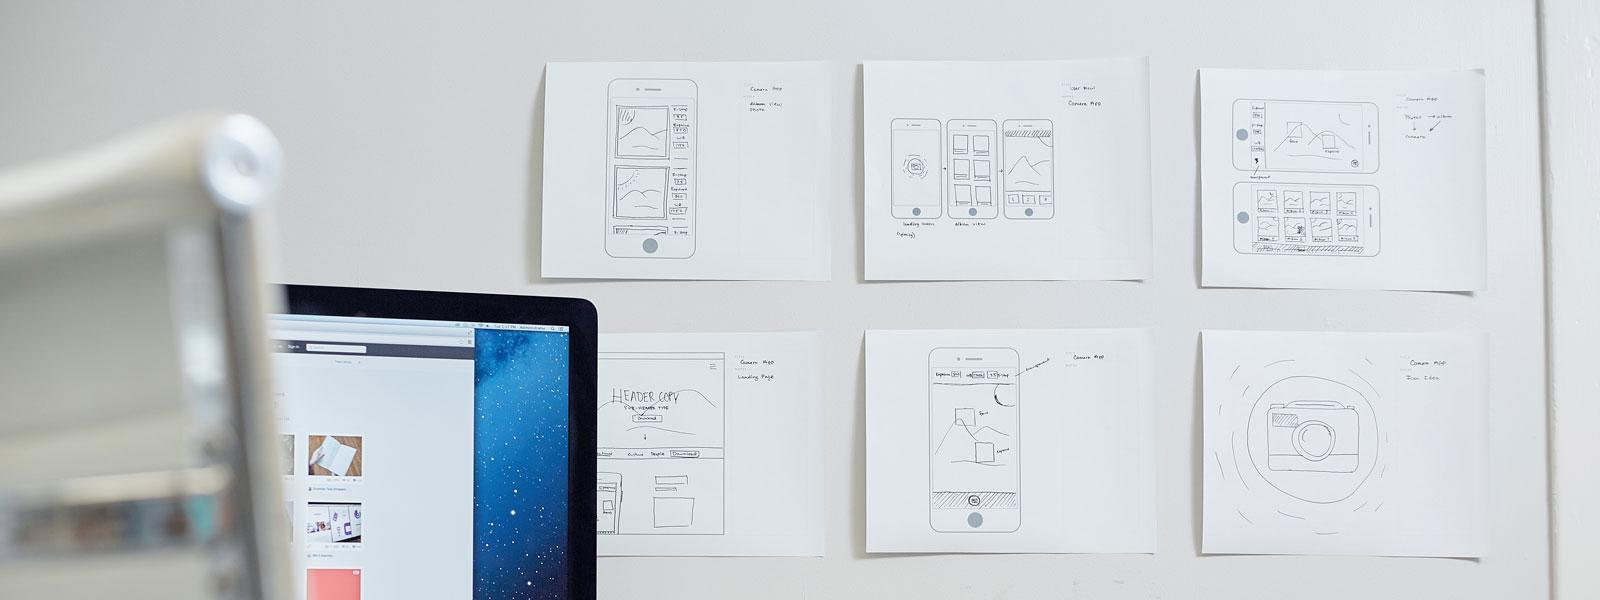 App Prototypes on a wall